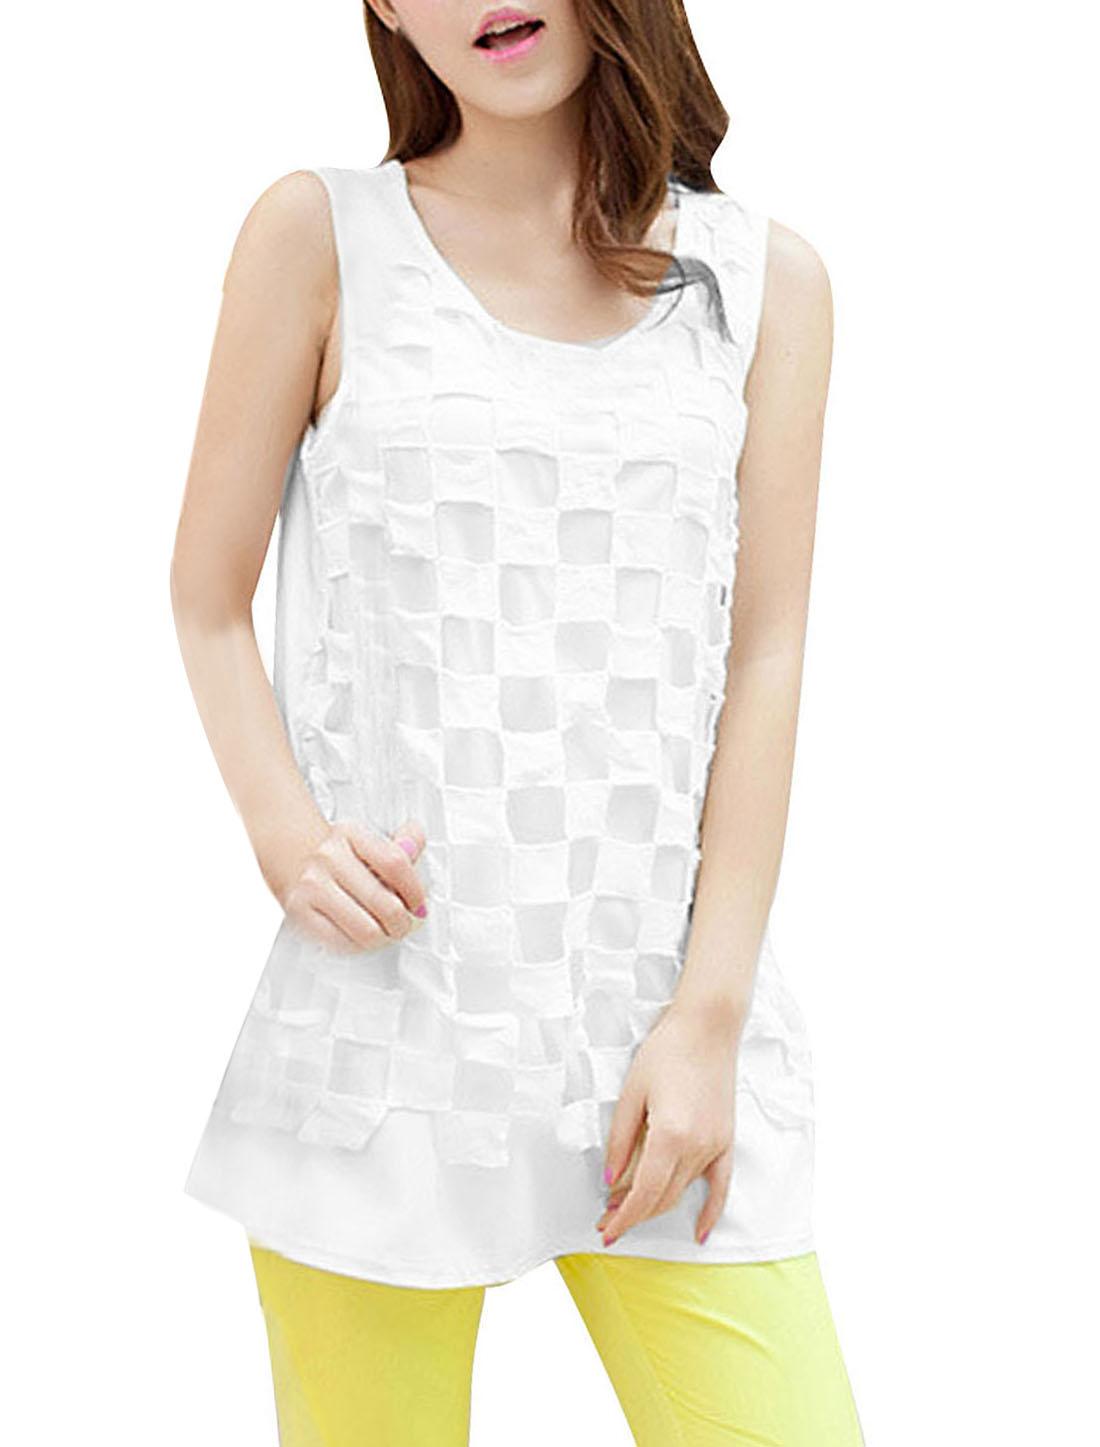 Ladies Round Neck Pullover Sleeveless Plaids Top Shirt White XS